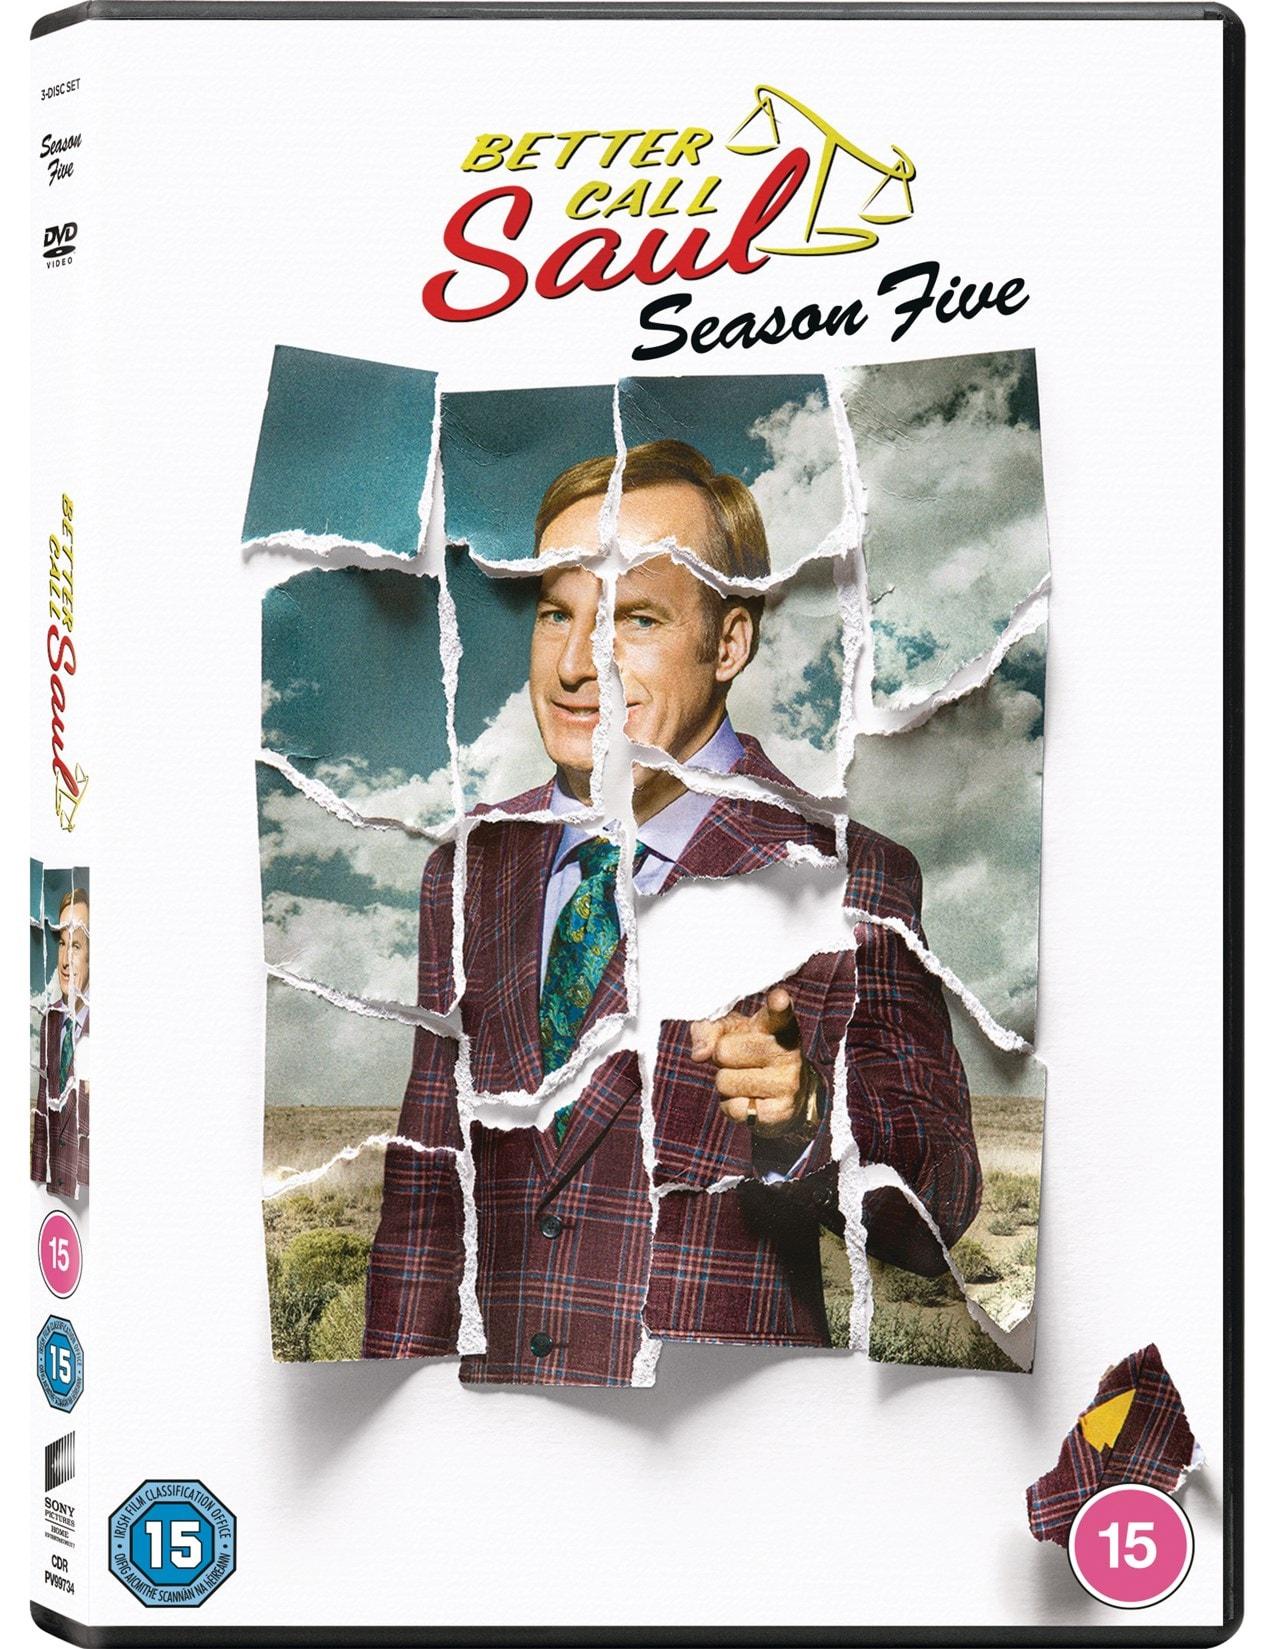 Better Call Saul: Season Five - 2